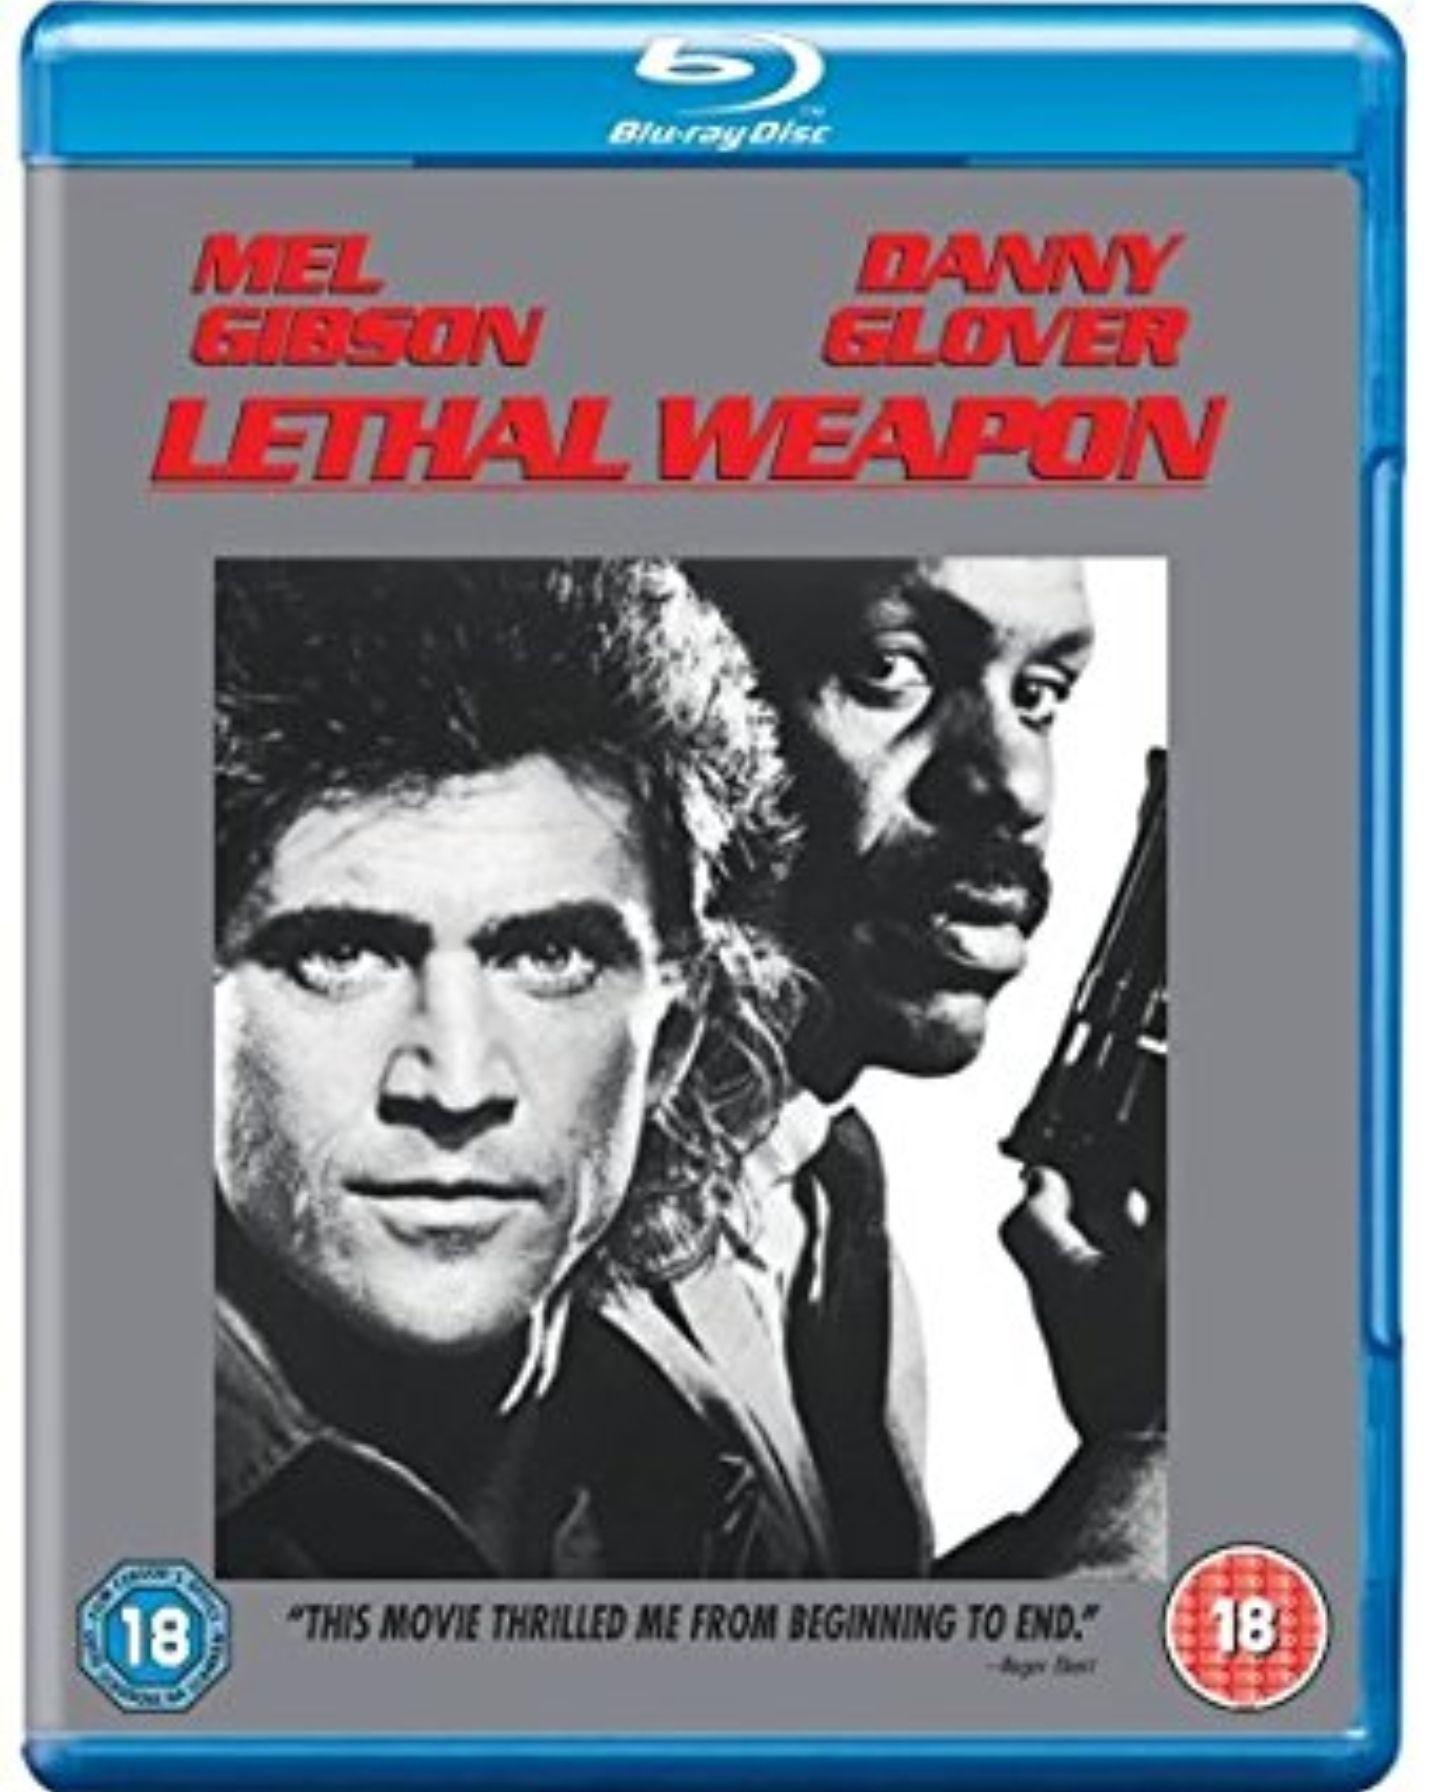 Lethal weapon bluray £1 @ Poundland